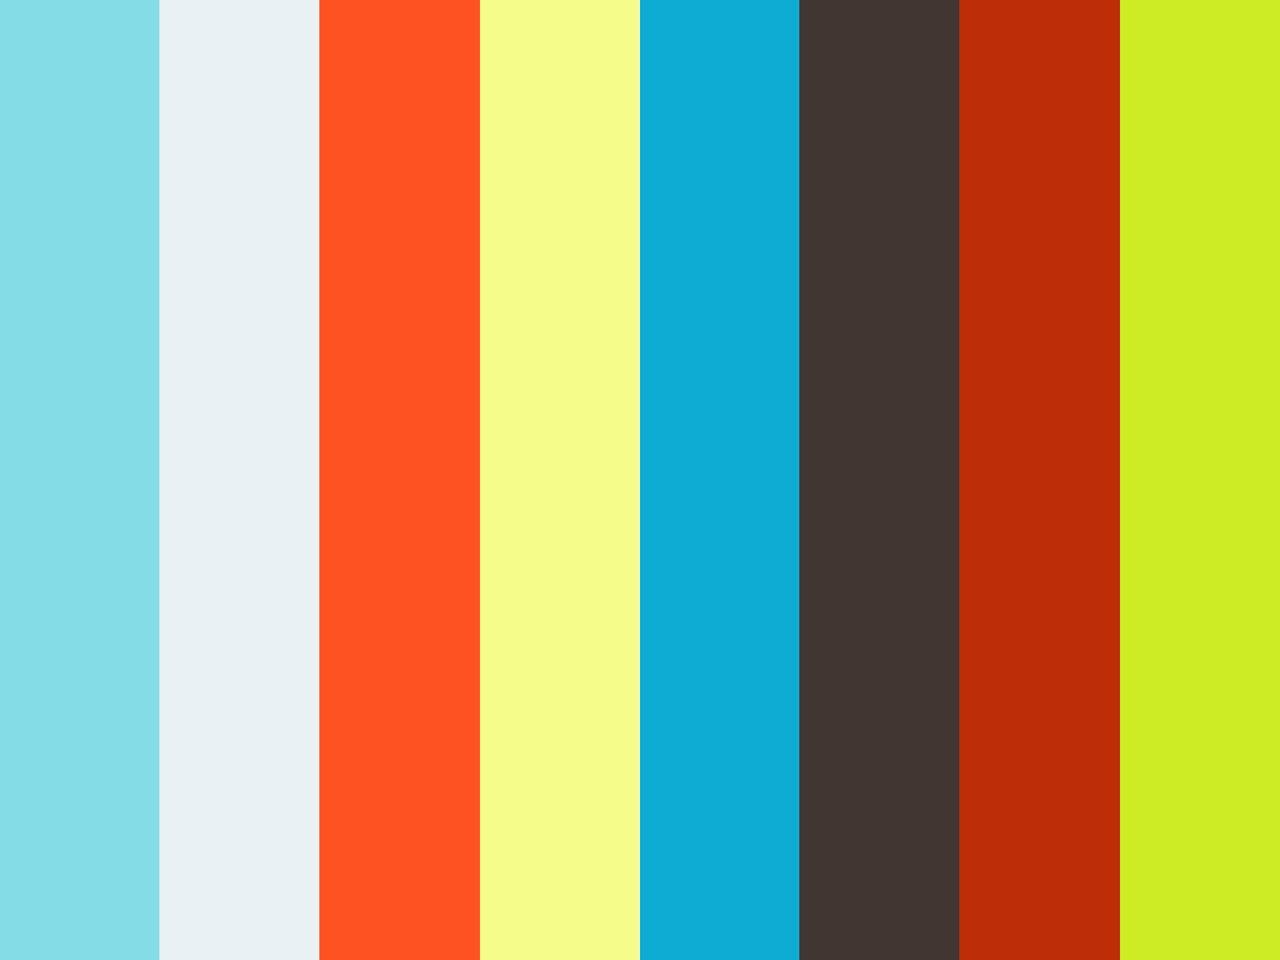 The Spark Notebook - A Popforms Kickstarter Project